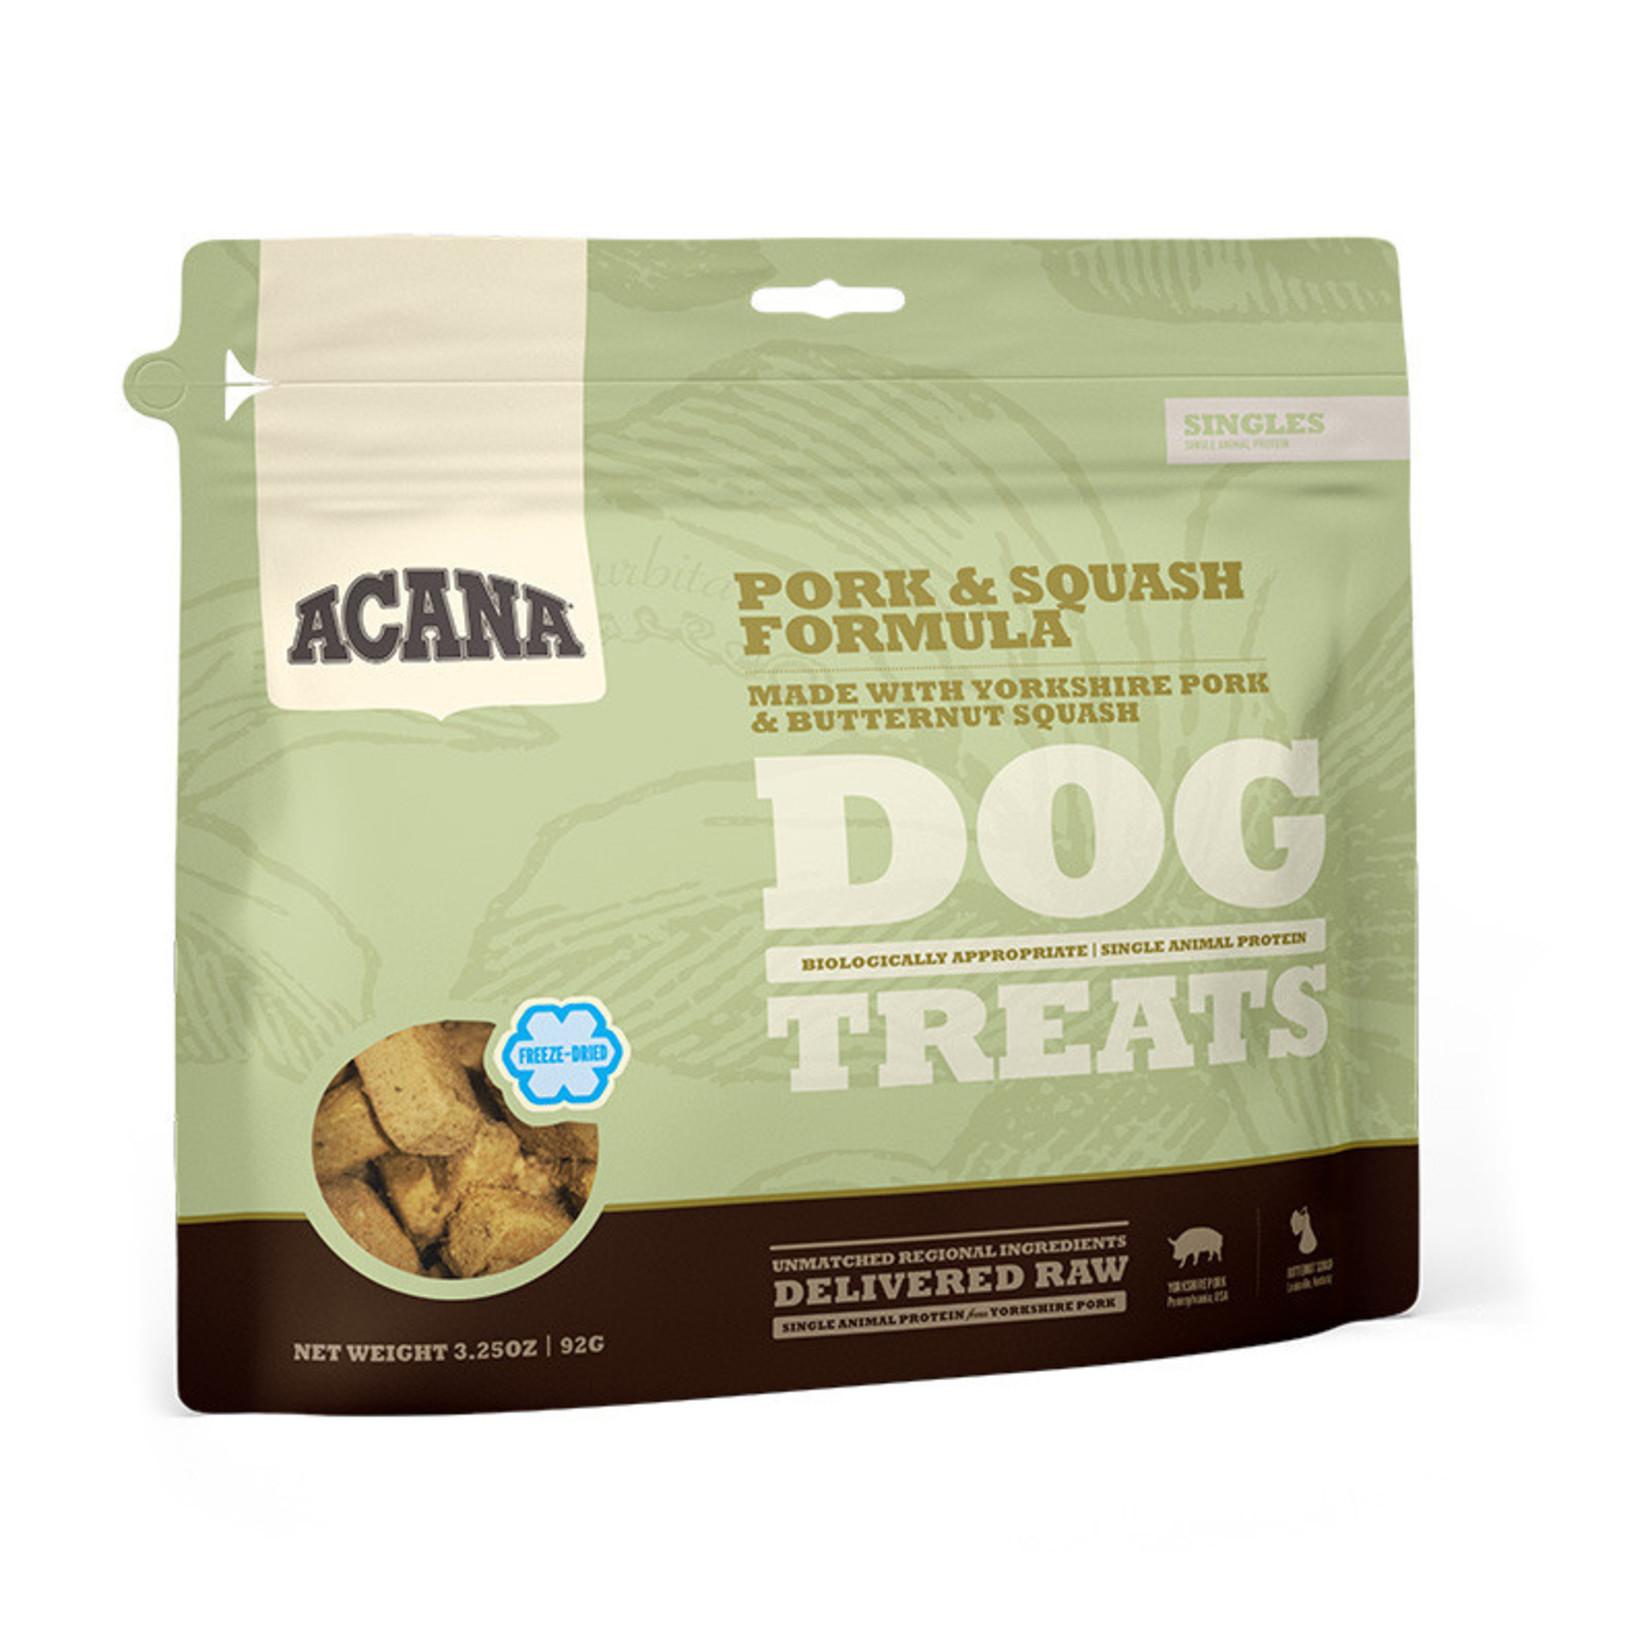 Champion Pet Foods Acana Dog Freeze-dried Pork & Squash Treat 3.25 OZ